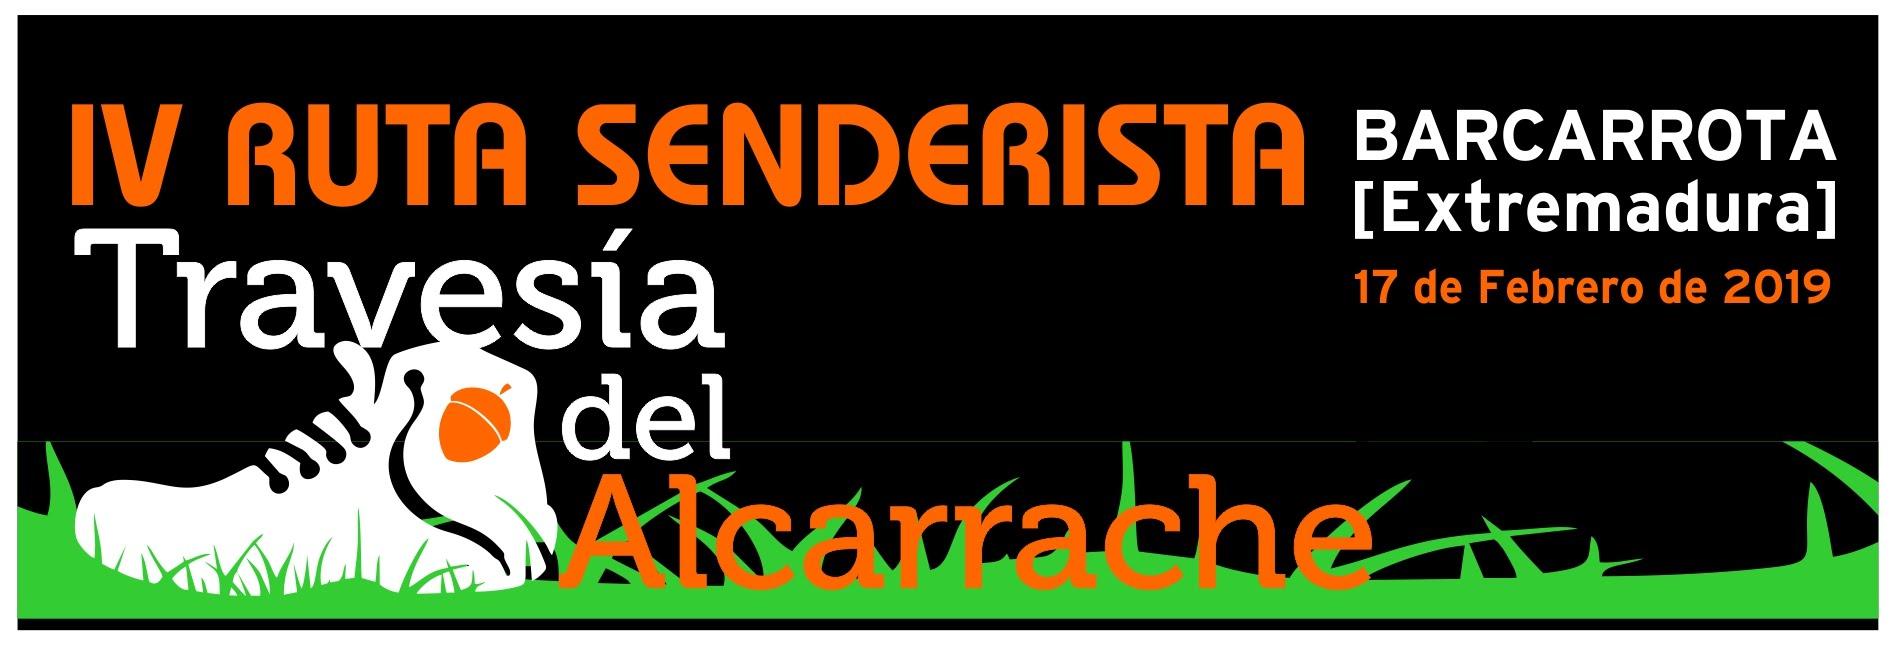 https://sites.google.com/alcorextremadura.org/travesiadelalcarrache2019/rutaalcarrache2019